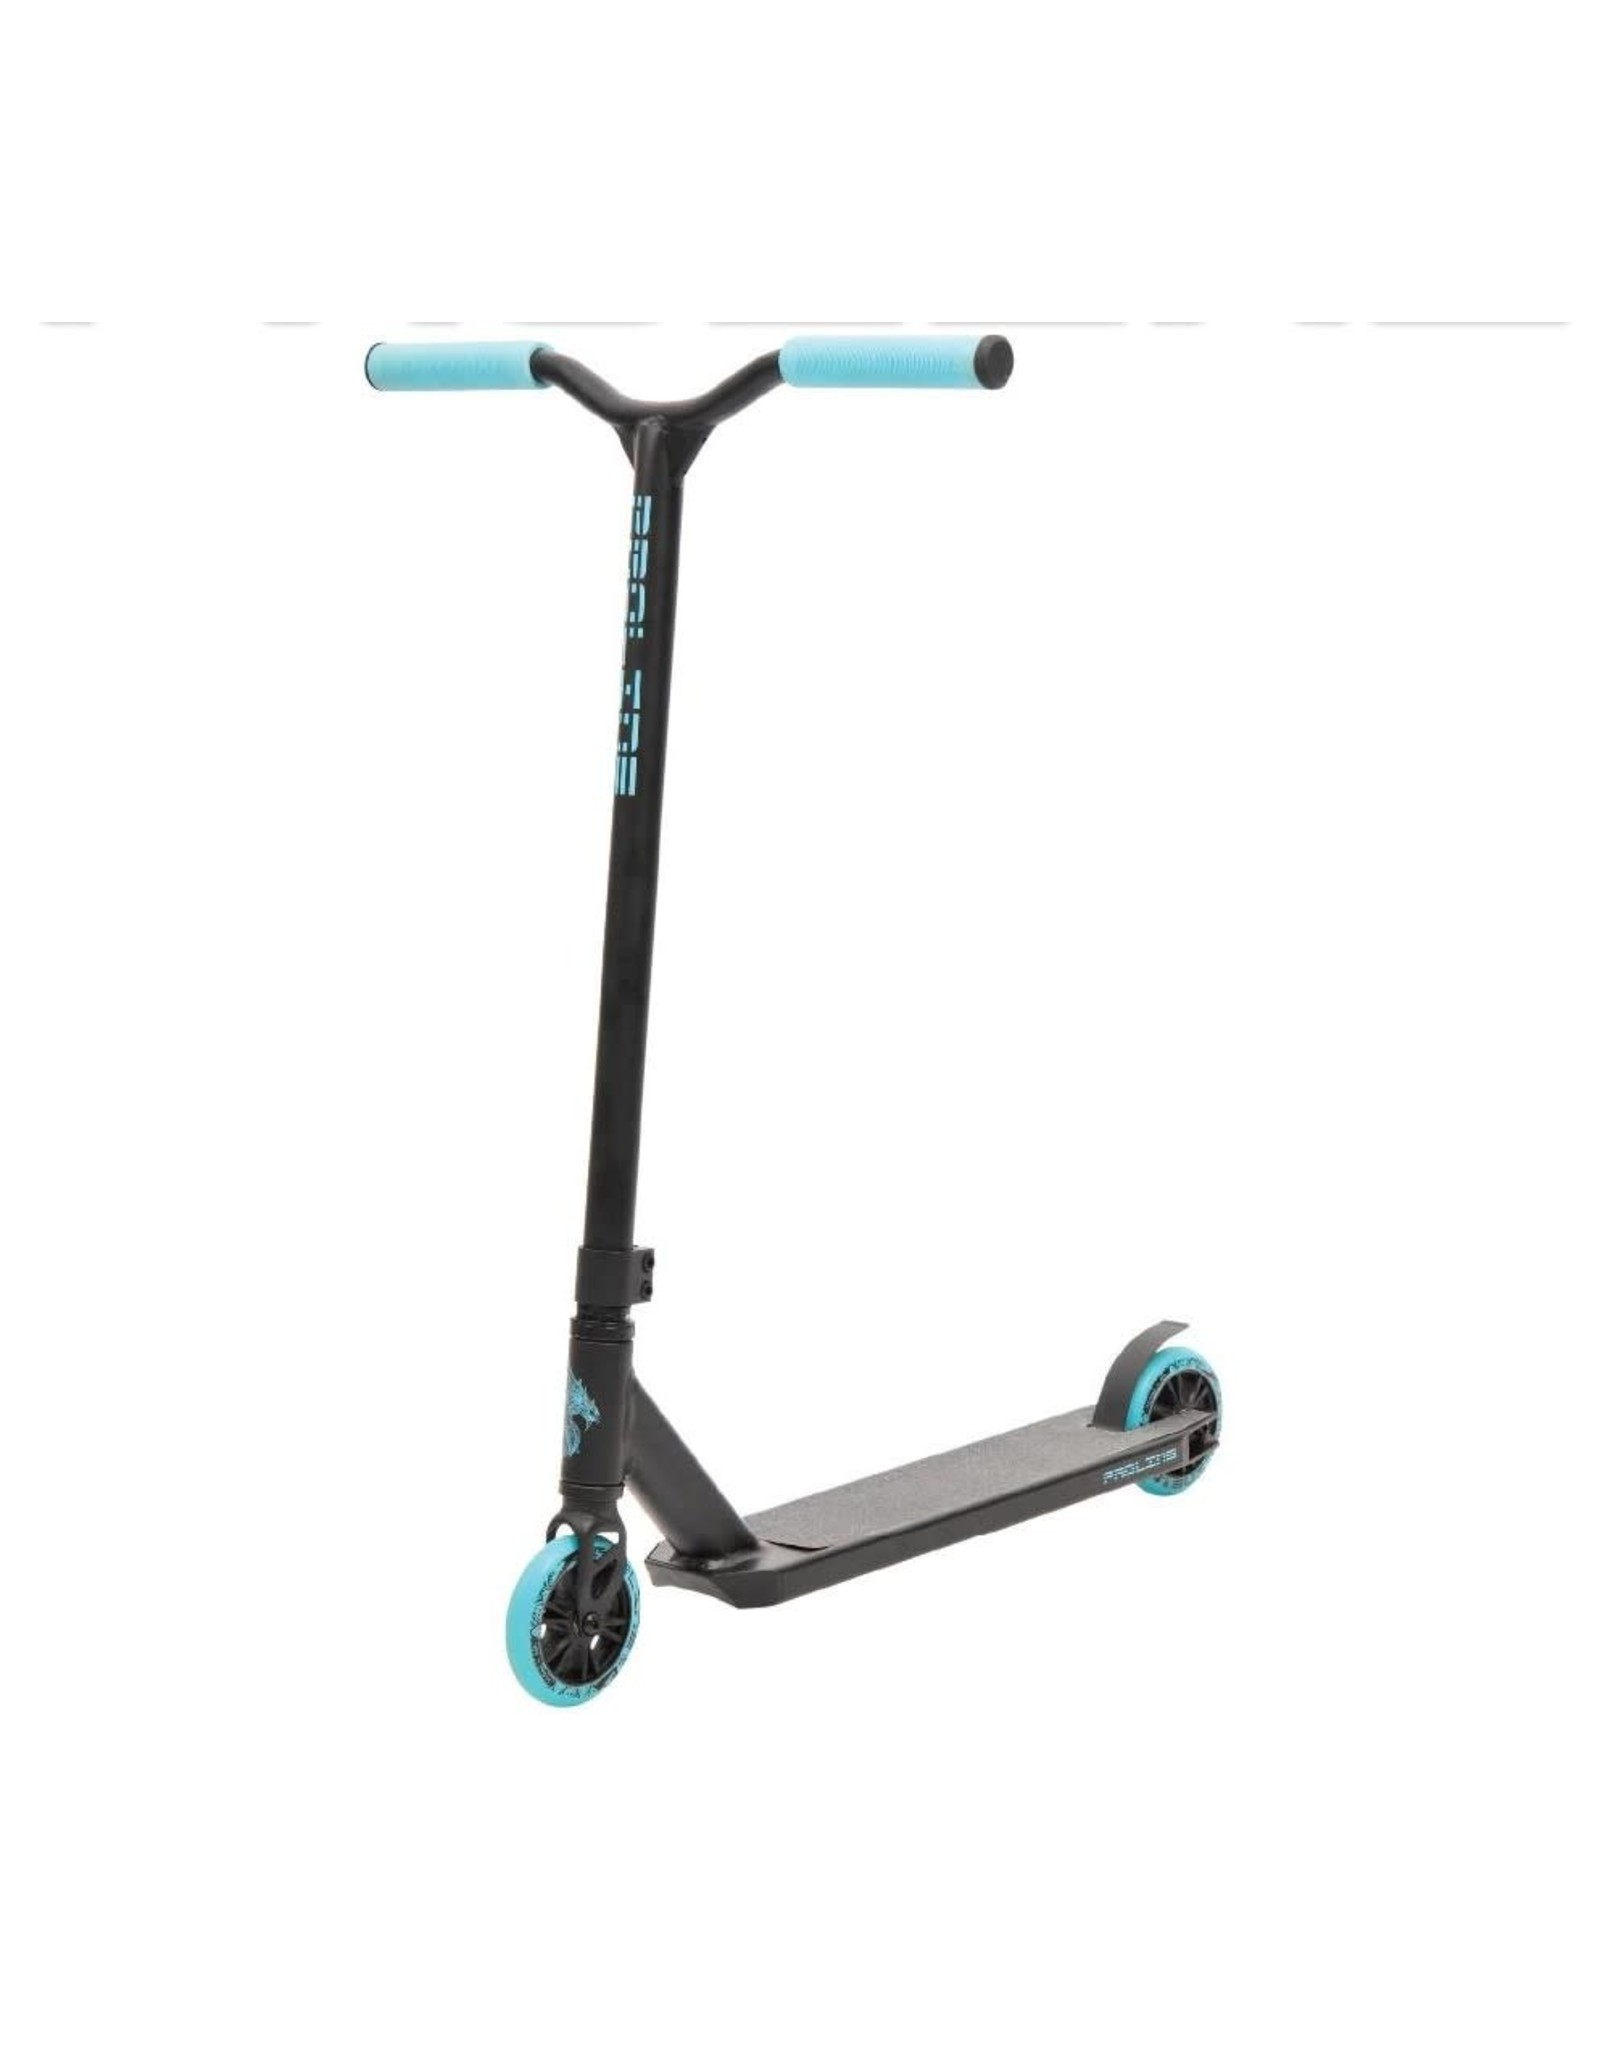 PROLINE Proline L1 Scooter